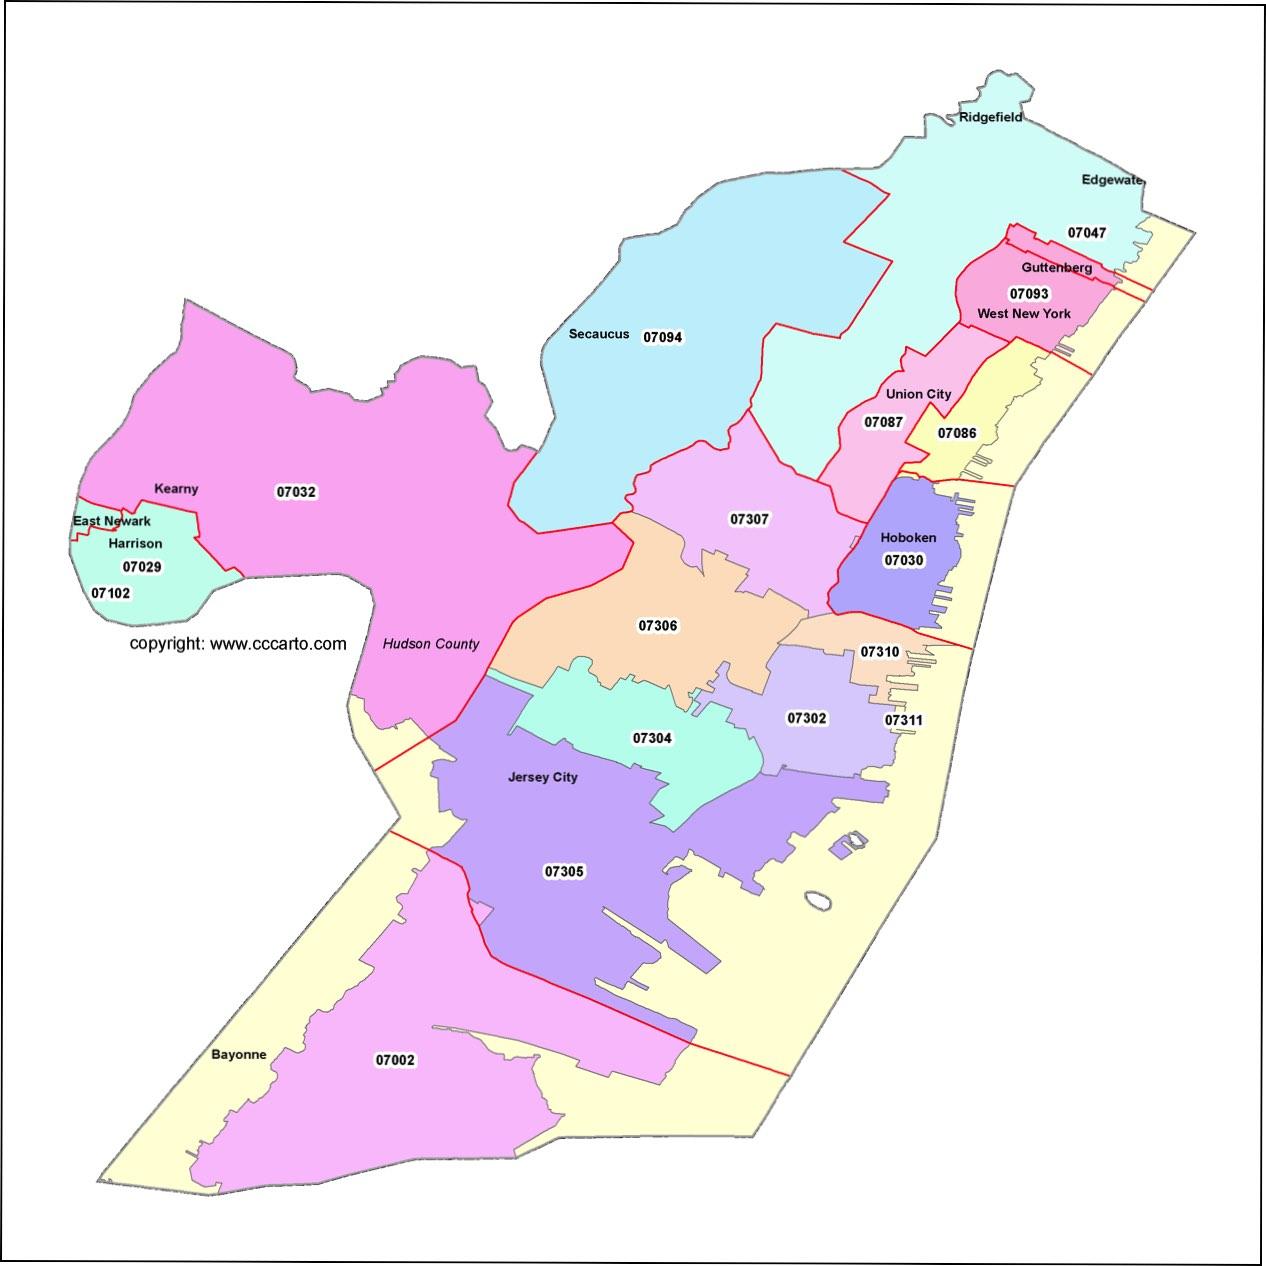 Hudson County Nj Zip Code Boundary Map